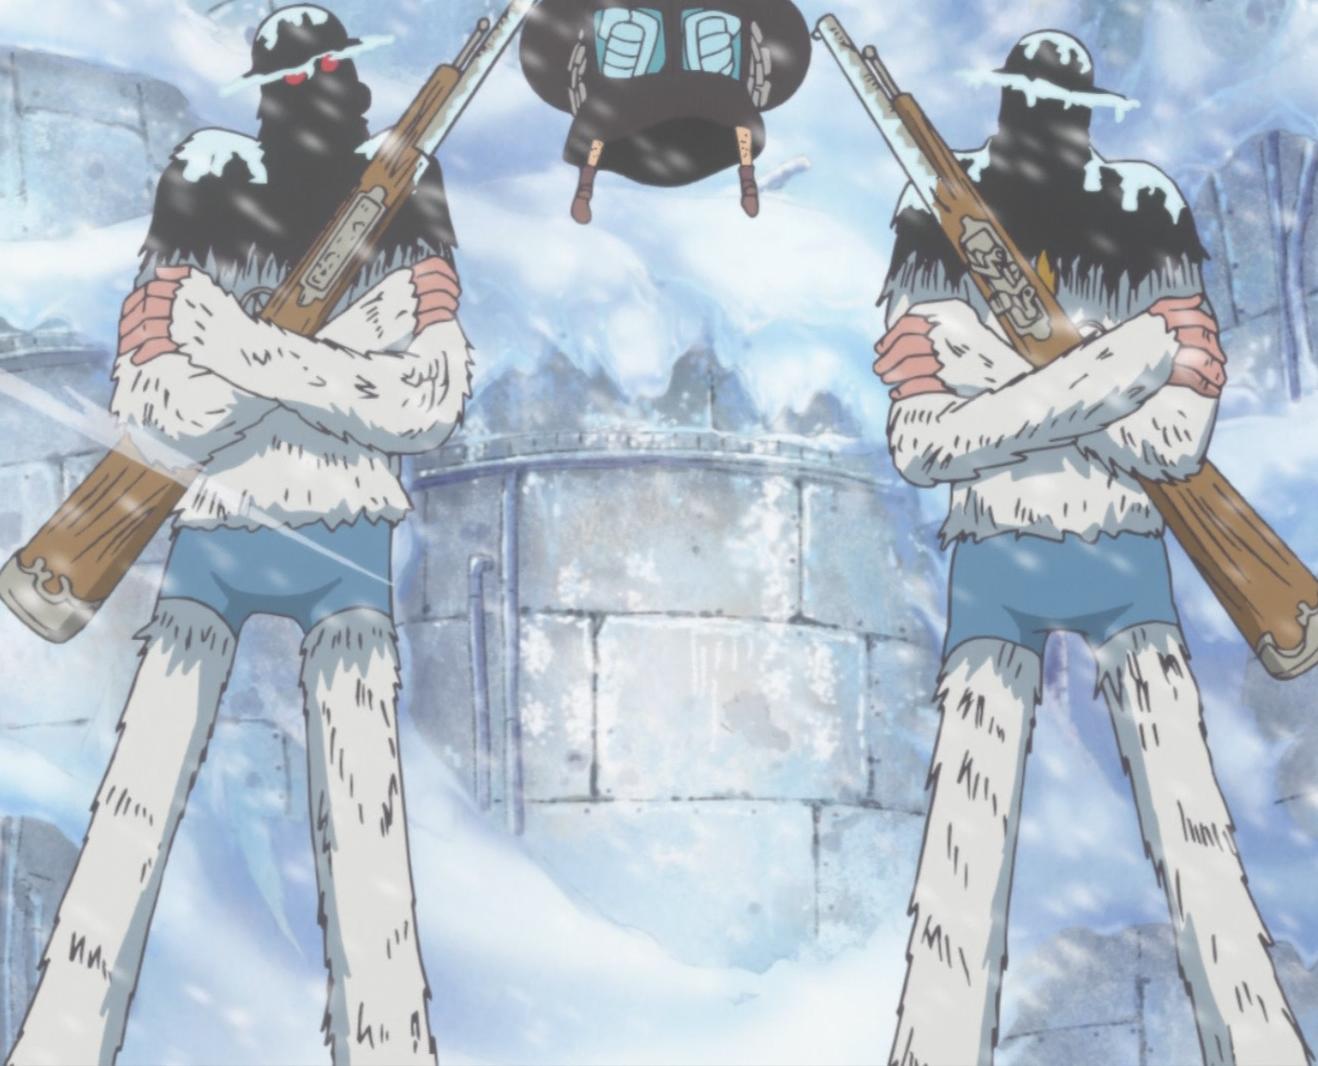 Yeti Cool Brothers